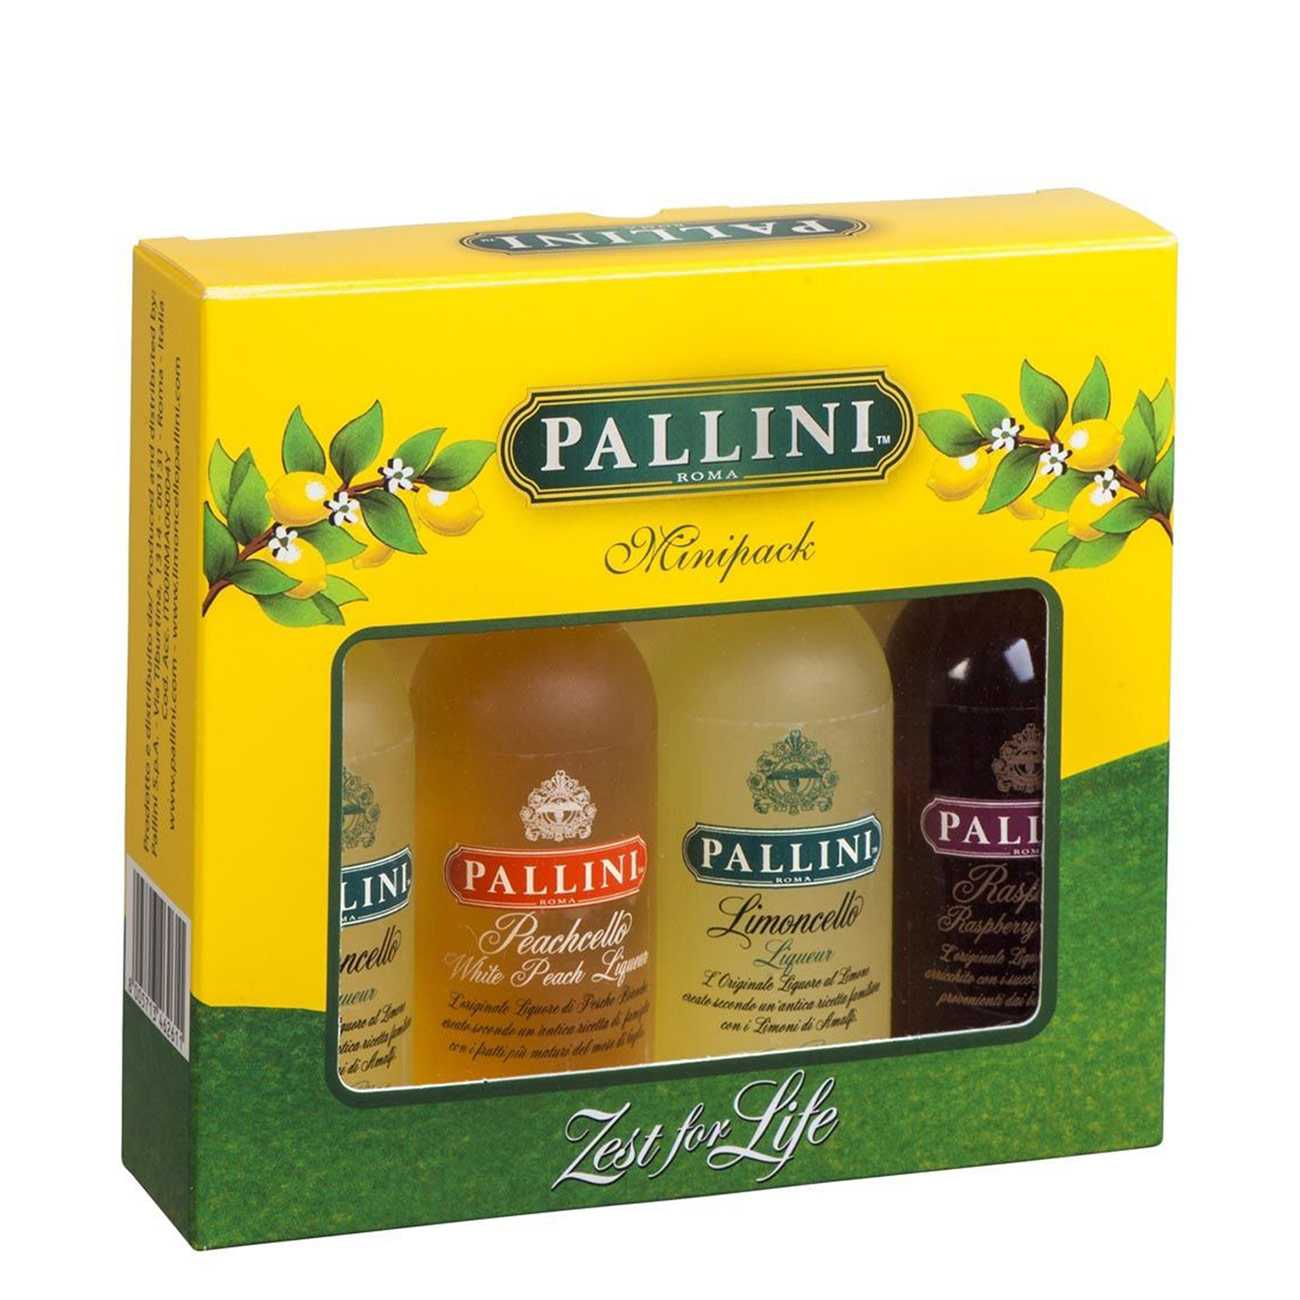 Lichior, PALLINI MINIPACK 200 ML, Pallini